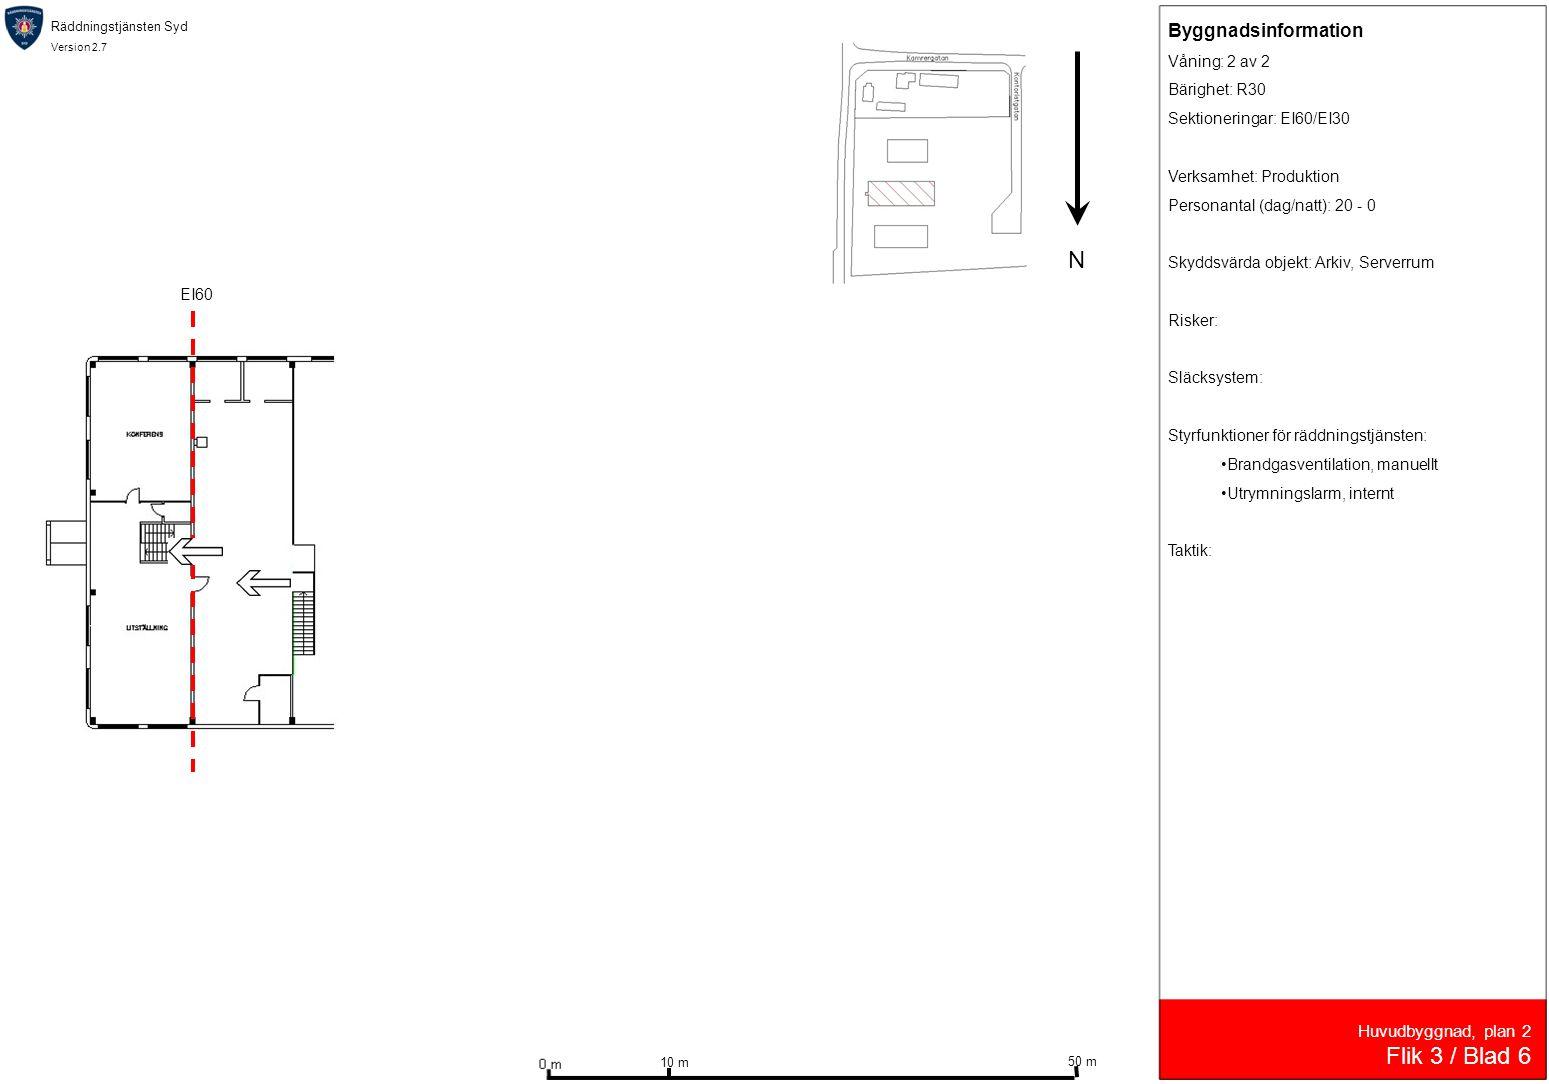 N Flik 3 / Blad 6 Byggnadsinformation Huvudbyggnad, plan 2